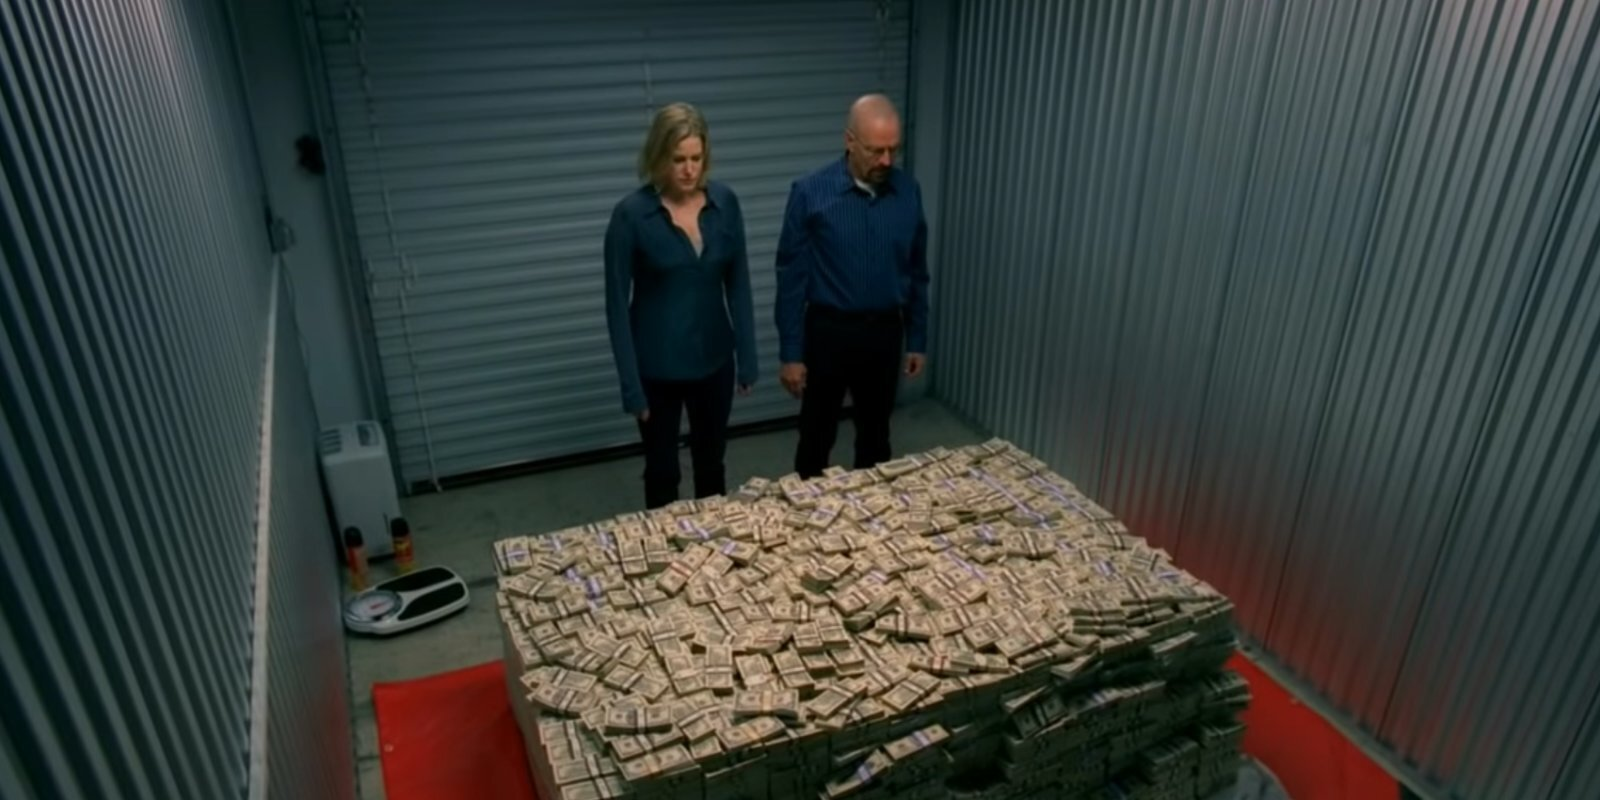 Nauda, nauda, nauda! Aizraujoši mūsdienu seriāli, kas fokusējas ap banknotēm